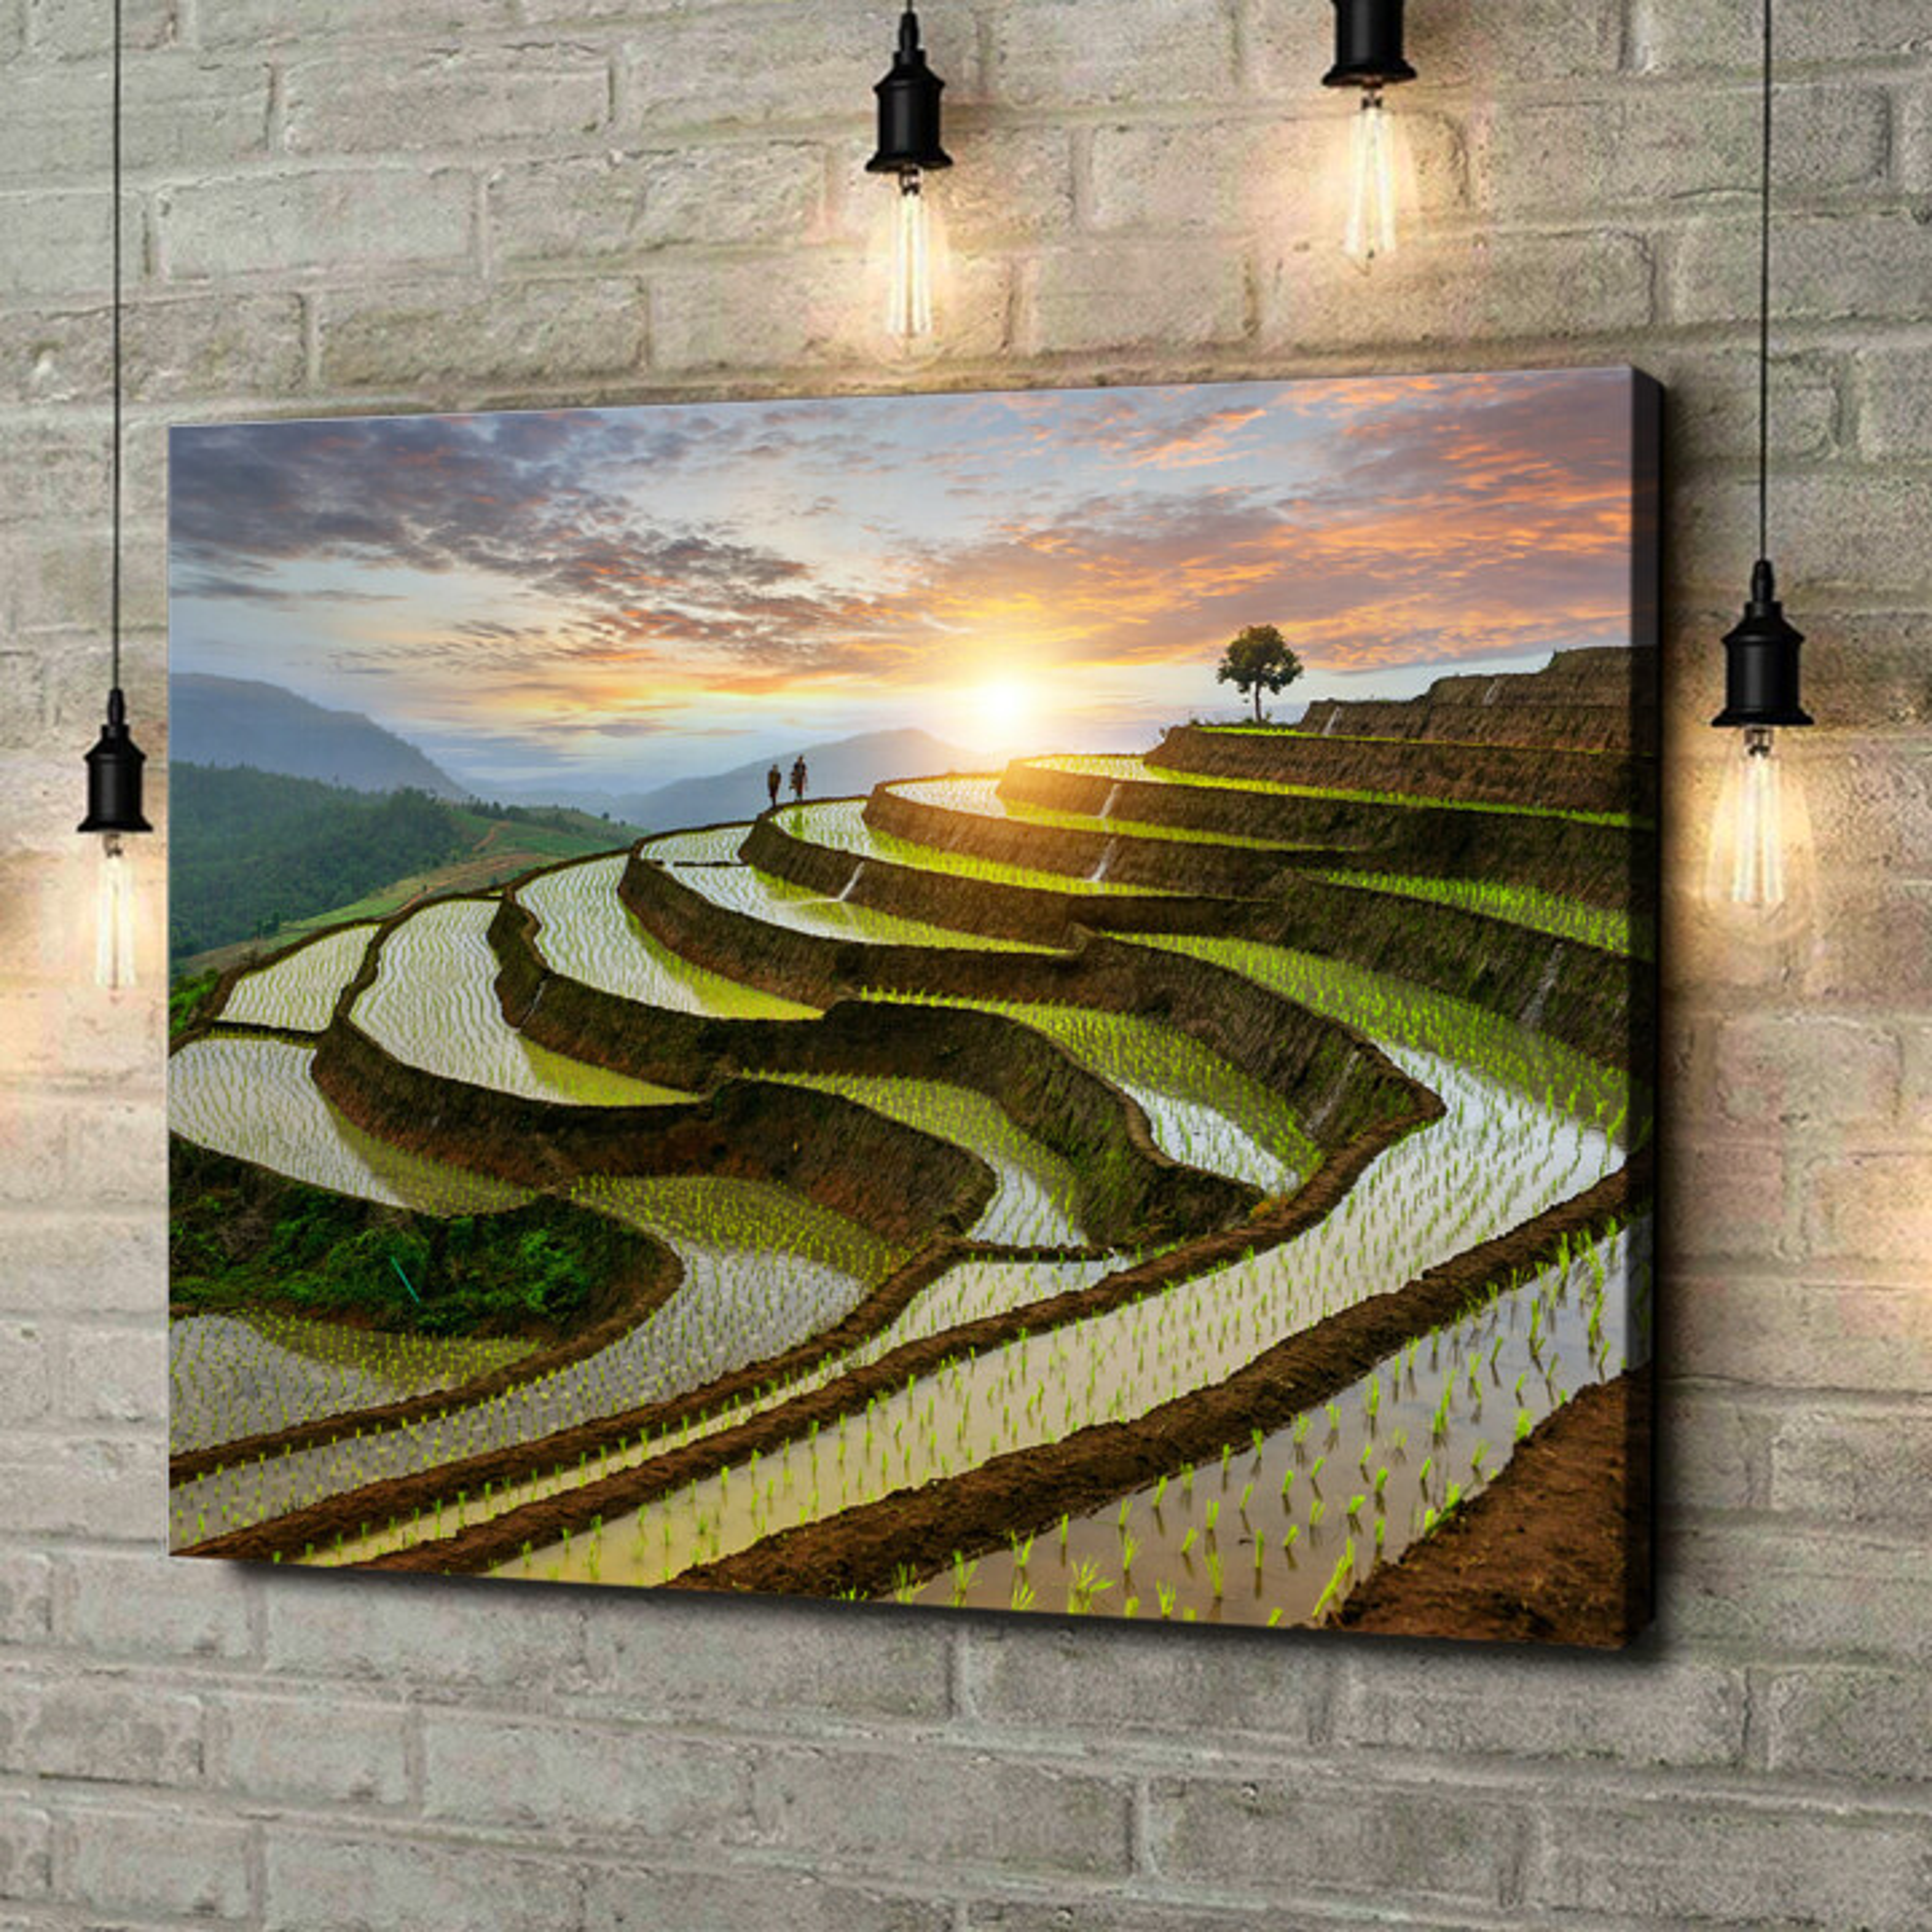 Leinwandbild personalisiert Reisfelder in Pa-Pong-Peang